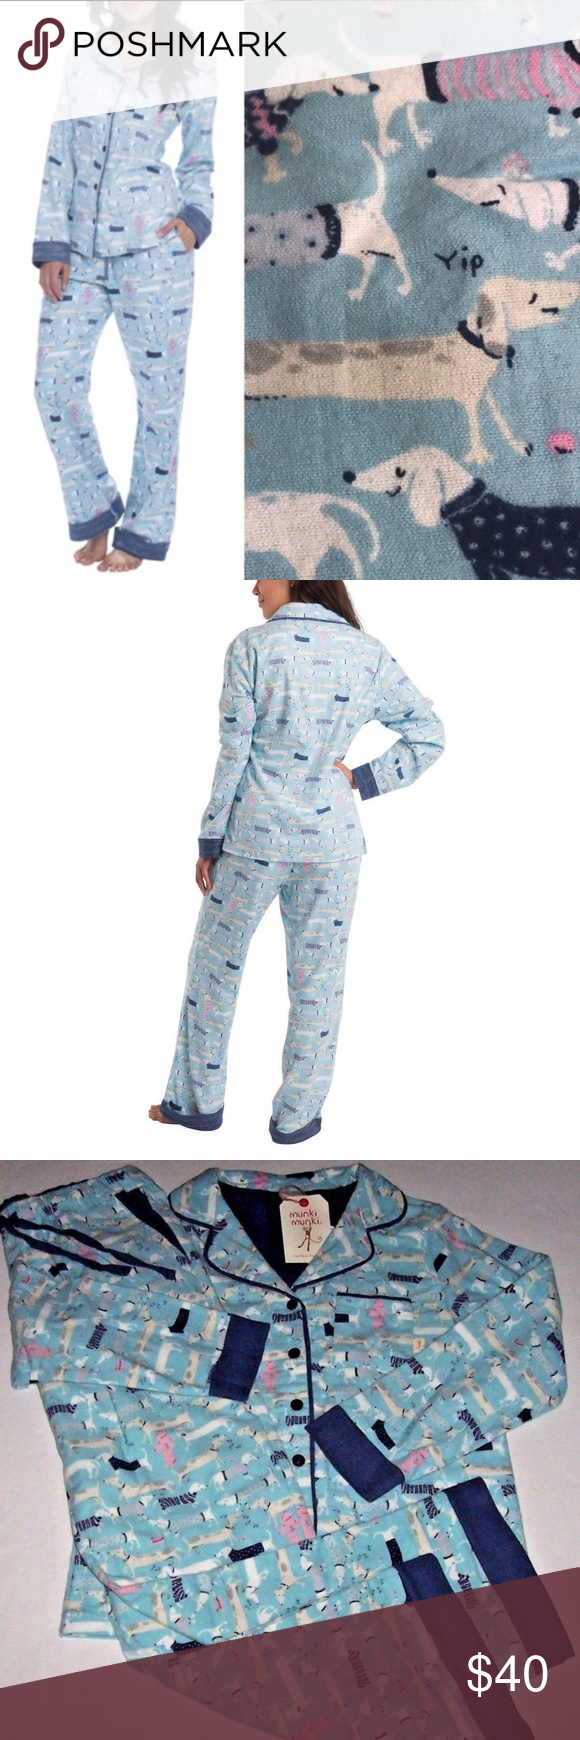 baeadbc7d6 Munki Munki Weiner Dogs Flannel Pajama Set Description Munki Munki Women s  Classic Long-sleeve Pajamas